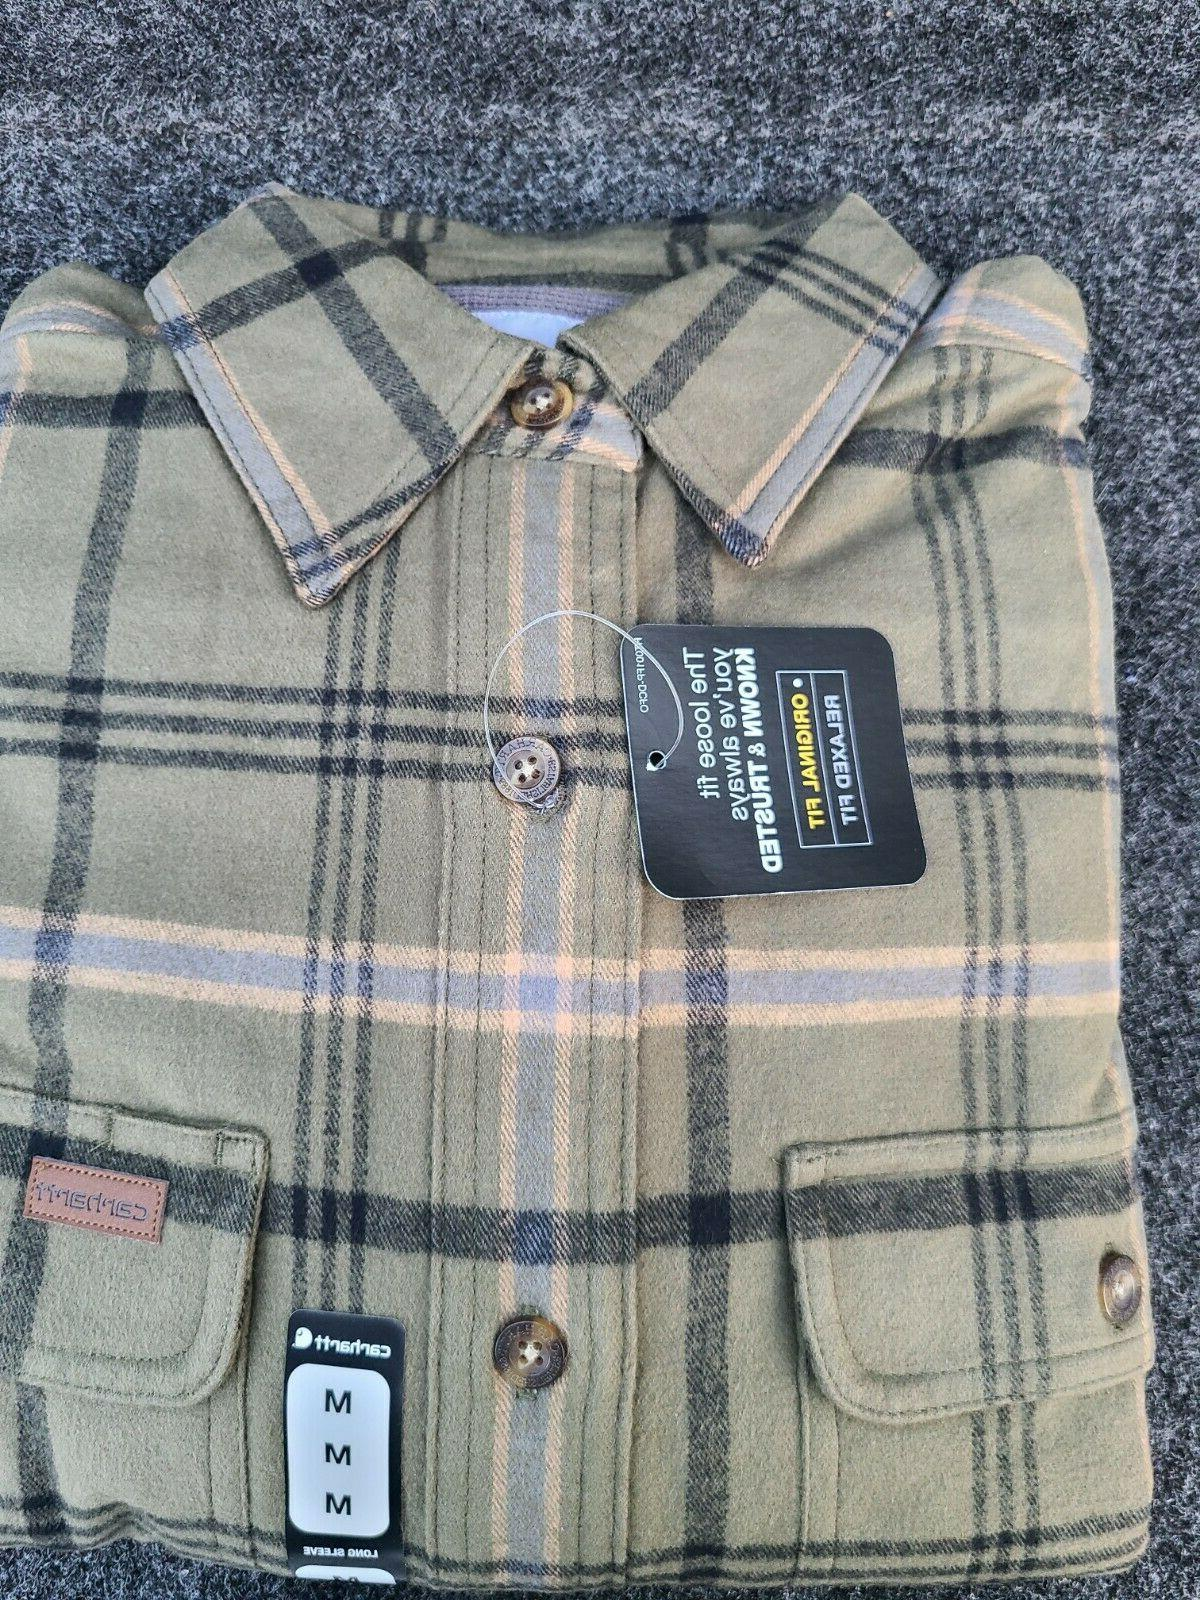 Carhartt Cotton 100% Shirts Size